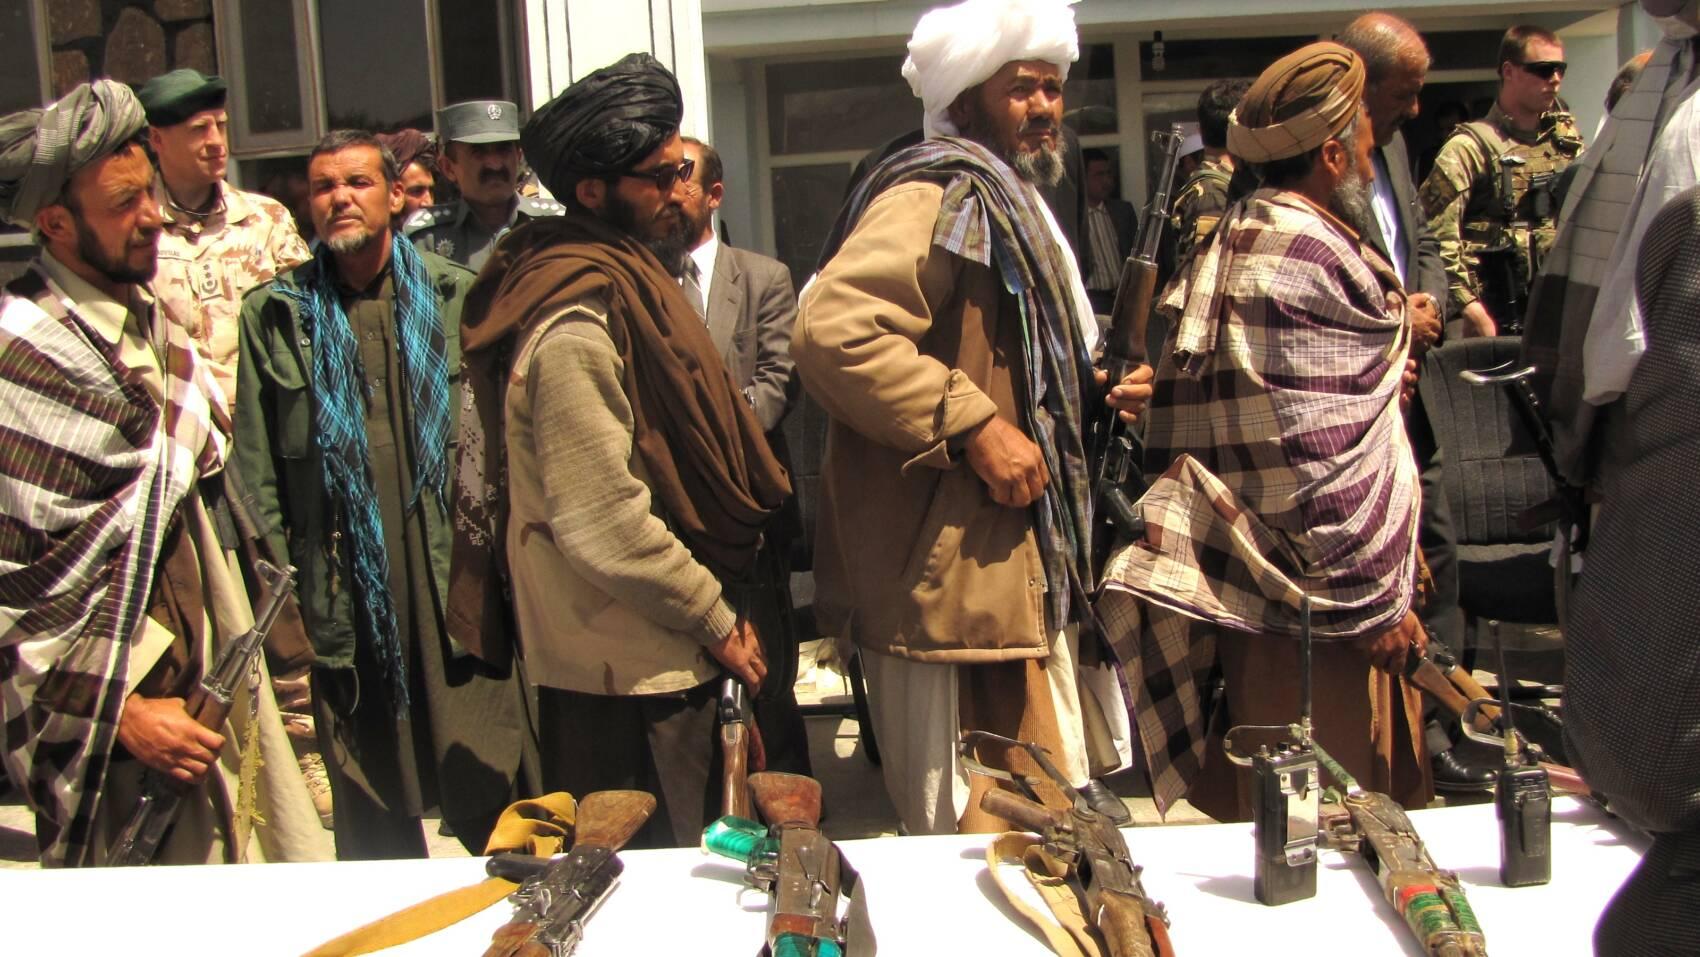 Democrats And Republicans Amp Up Criticism of Biden Over Afghanistan